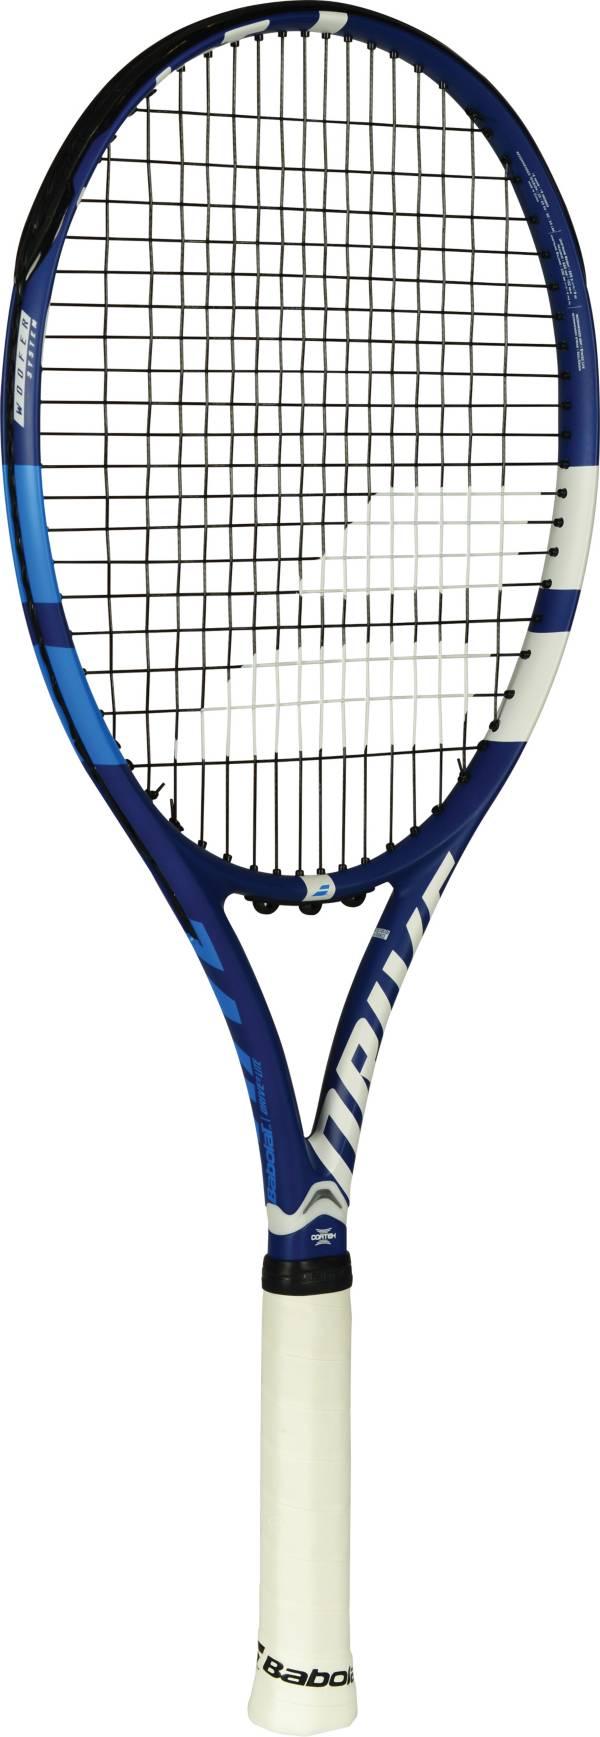 Babolat Drive G Lite Tennis Racquet - Unstrung product image